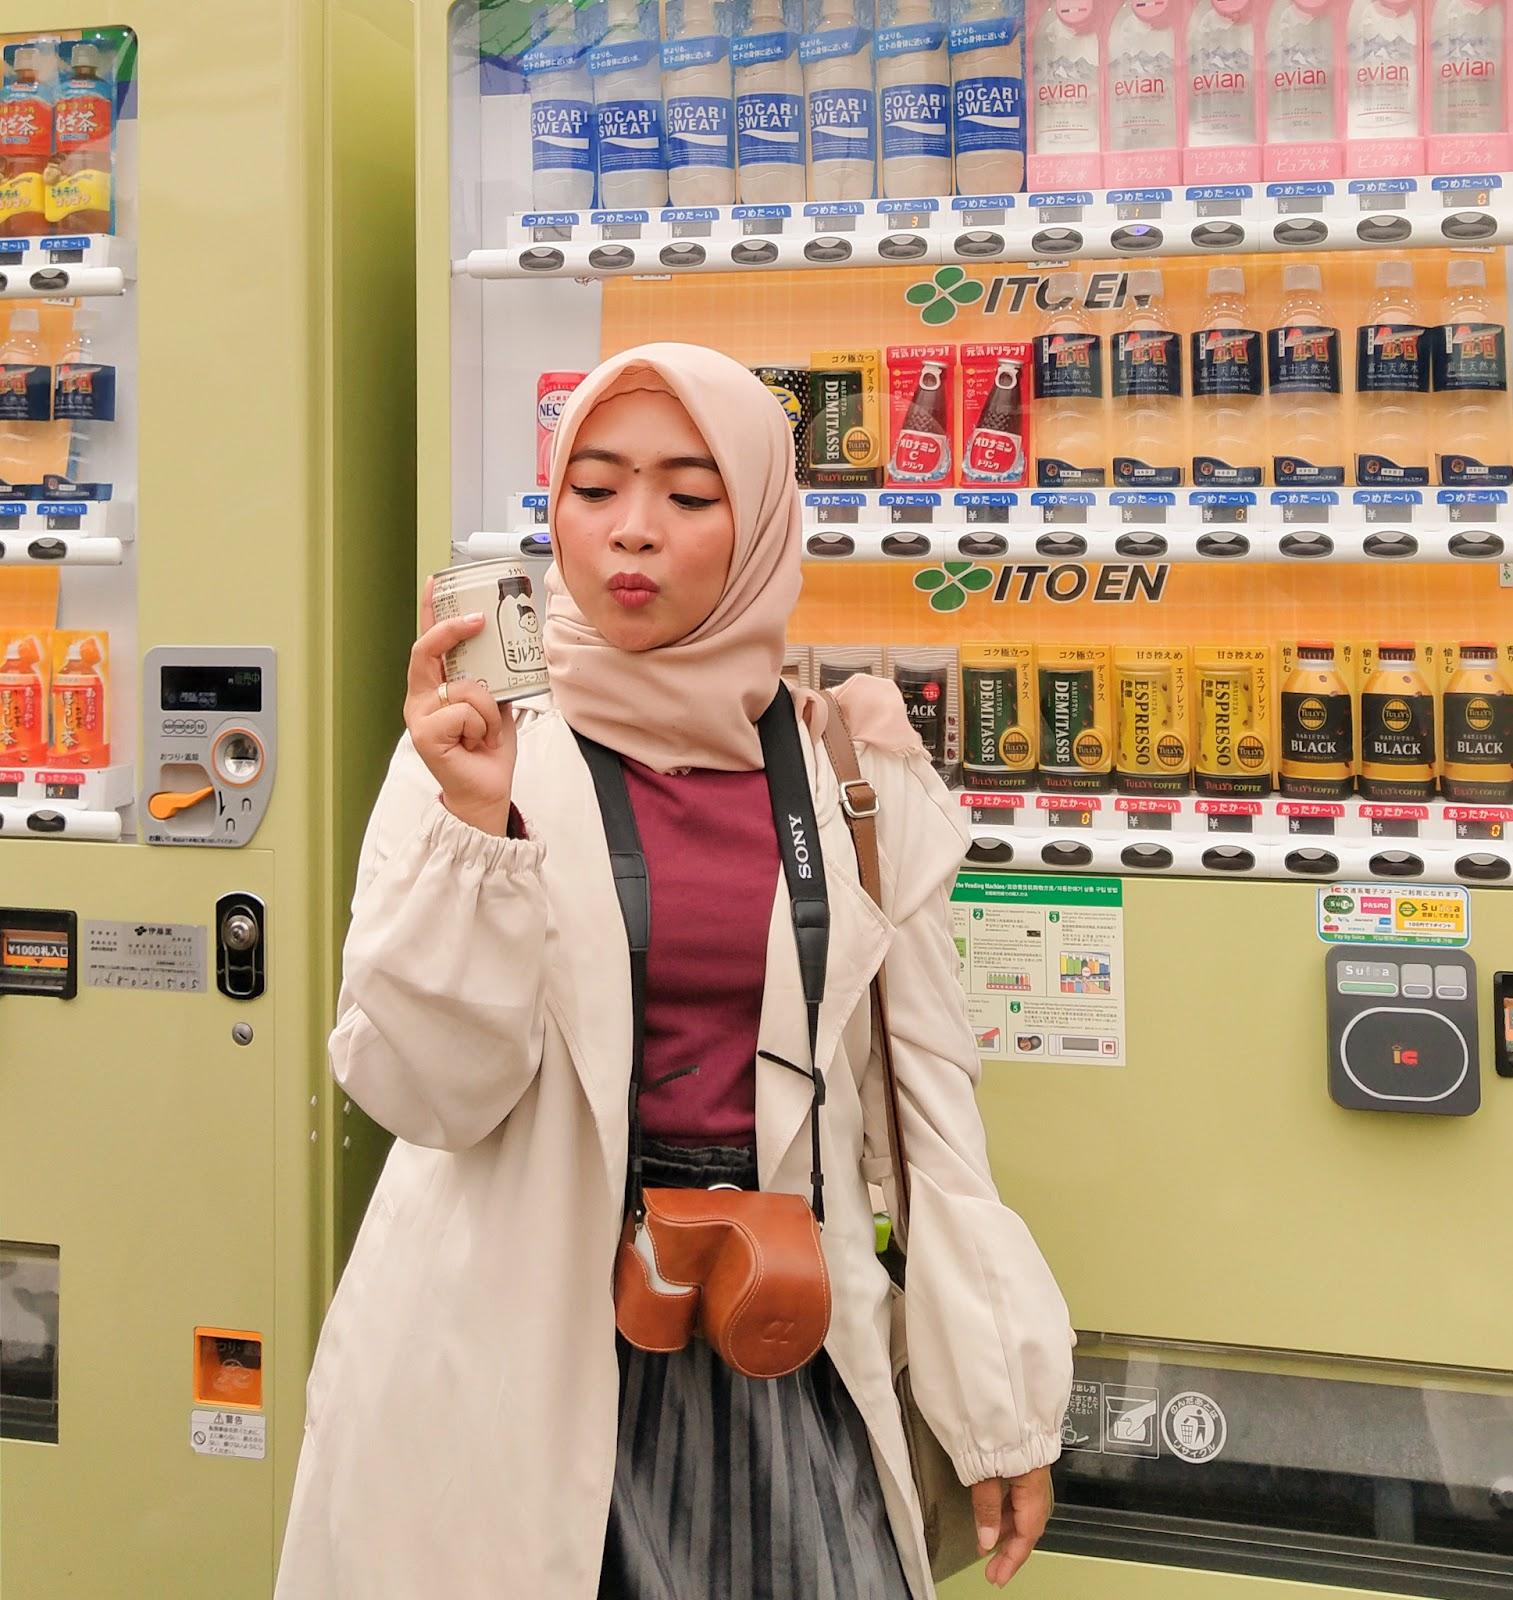 wisata kuliner di jepang, japanese vending machine, jepang kuliner